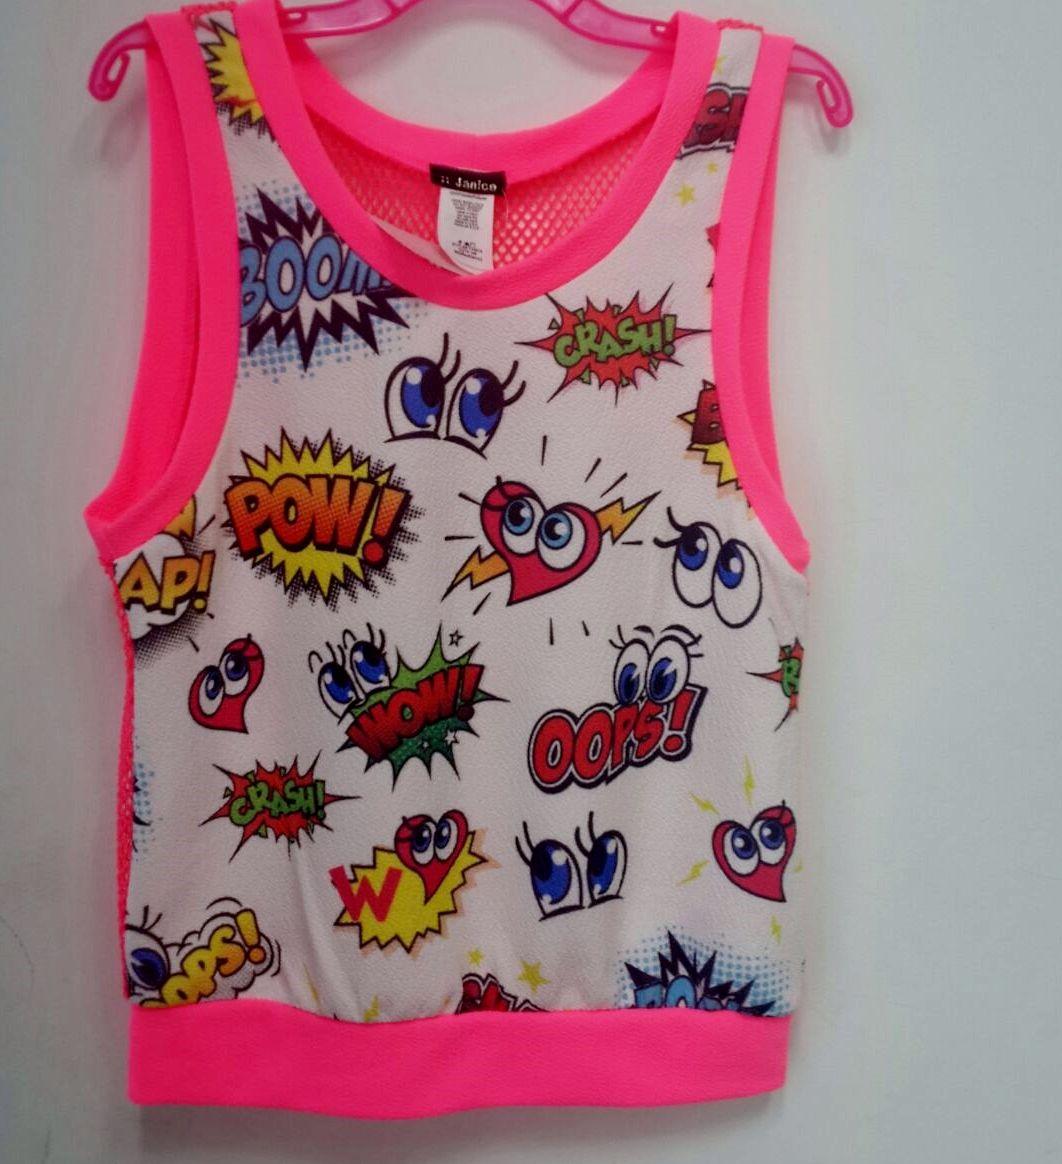 #shirts #blusas #camisetas #pop #colors #funny